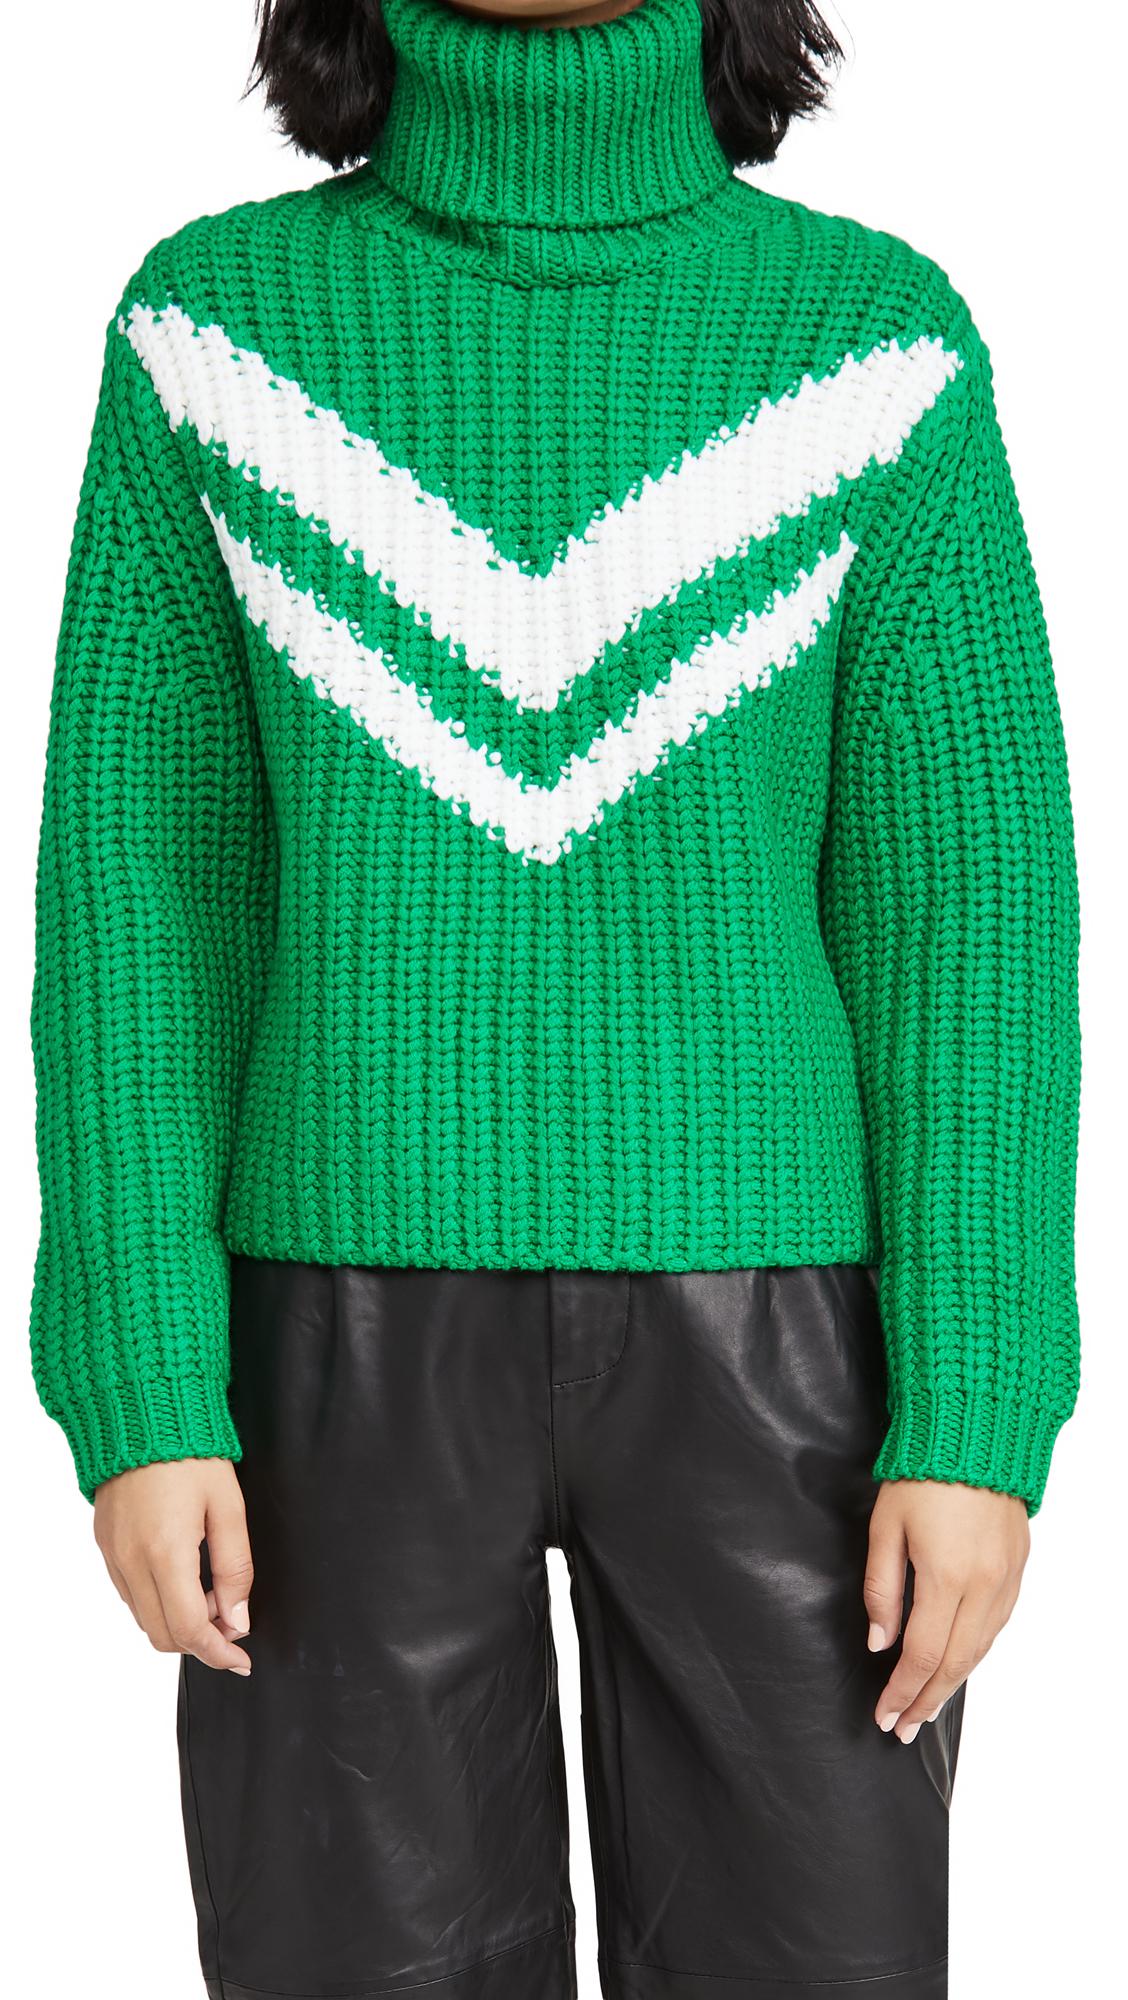 Tory Sport Merino Chevron Turtleneck Sweater